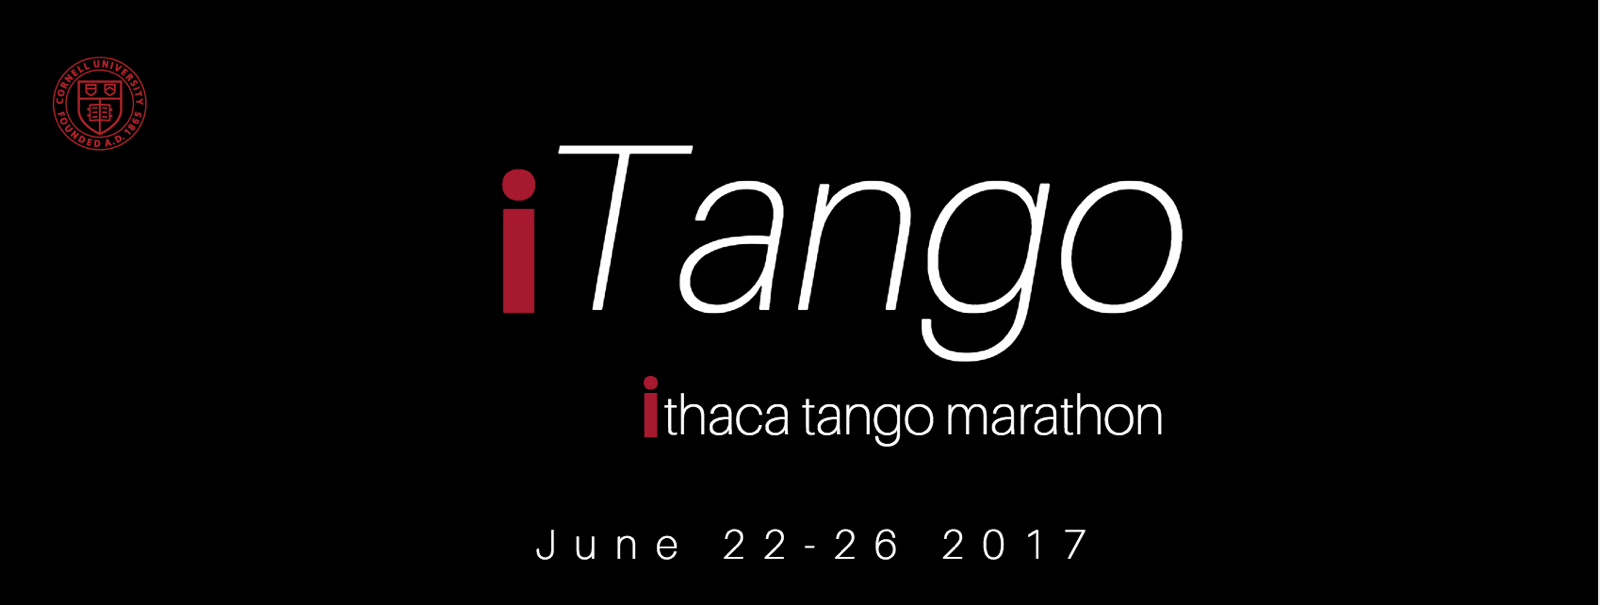 iTango - Ithaca Tango Marathon